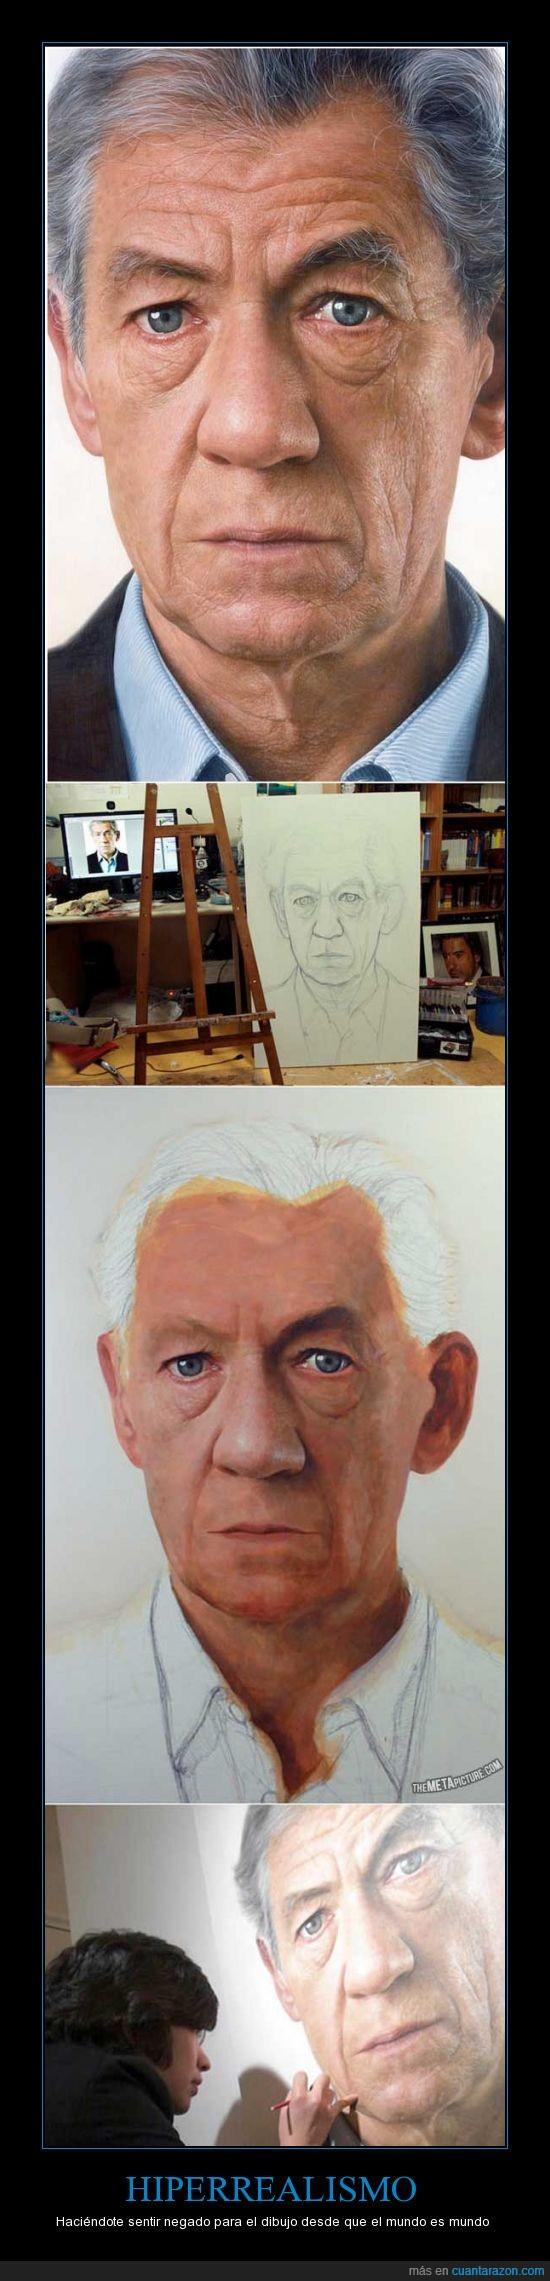 cuadro,dibujo,gandalf,hiperrealista,lienzo,magneto,sir Ian McKellen